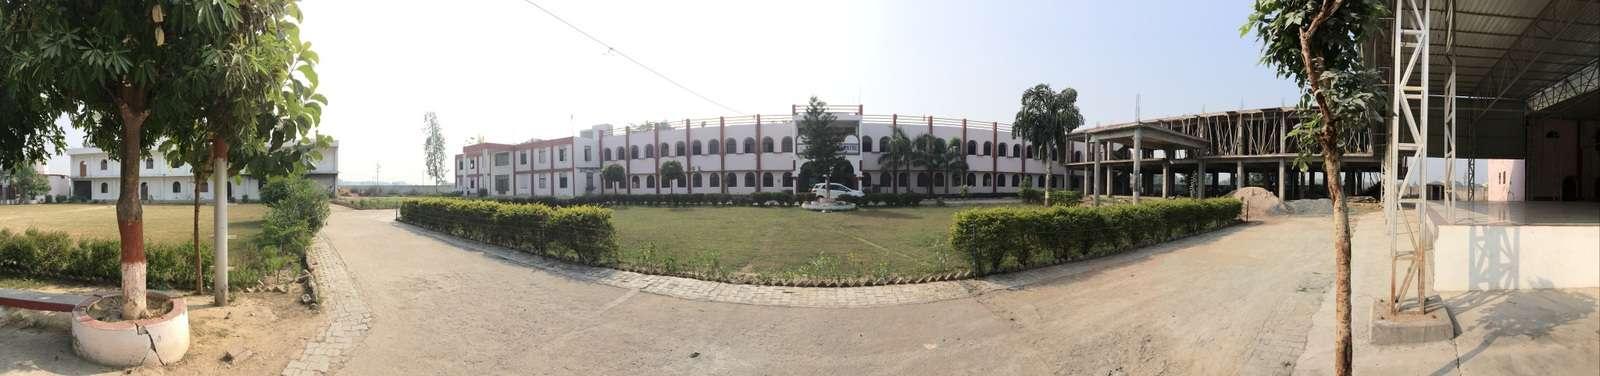 R K EDUCATION CENTRE MAHARAJPUR G T ROAD KANPUR UTTAR PRADESH 2130848